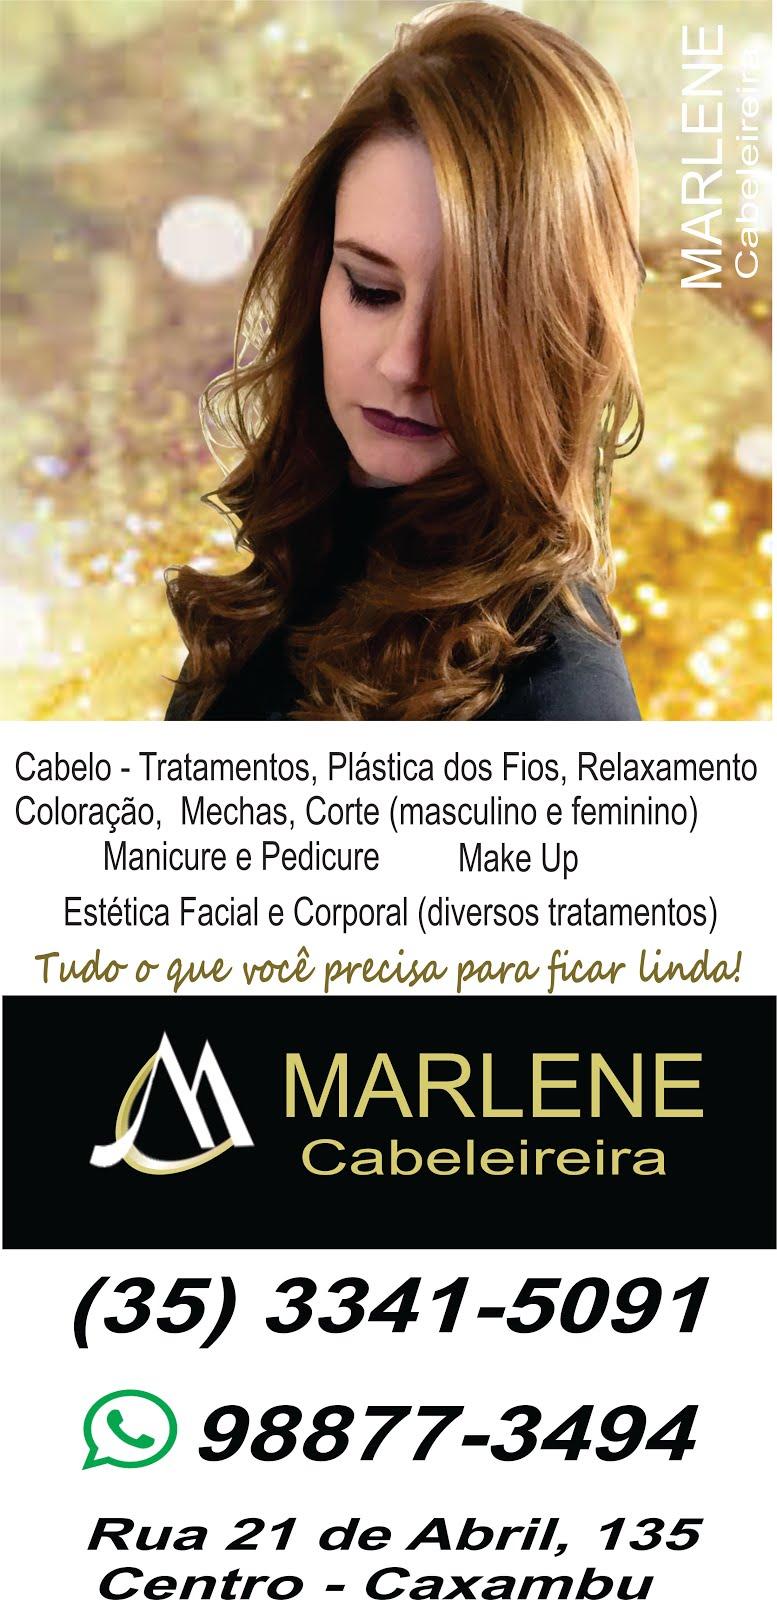 Marlene Cabeleireira